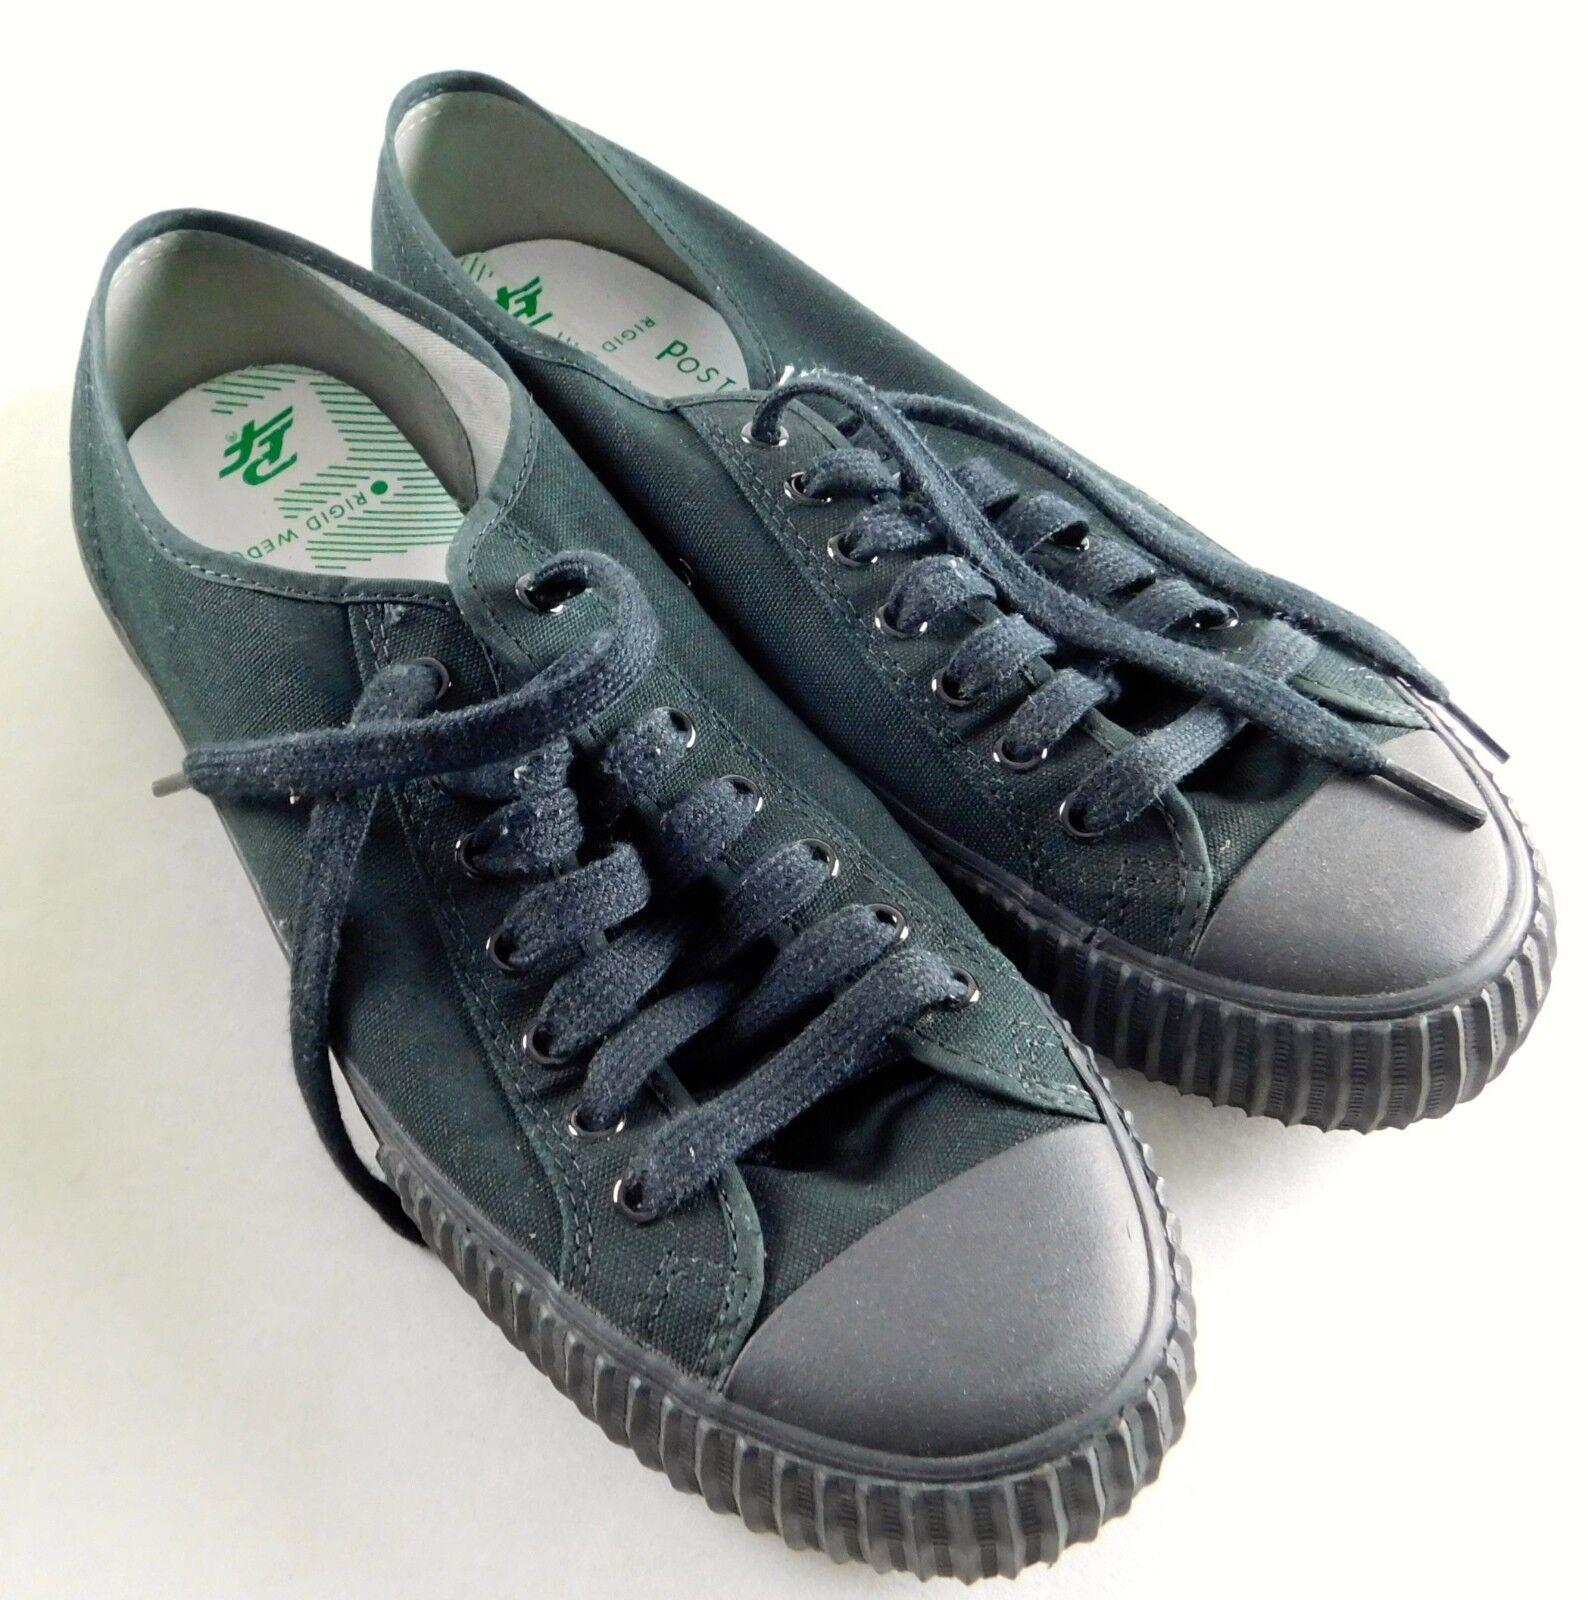 Pf FLYER Sandlot película aniversario Zapatos Talla Adulto Unisex 1/2 13 14 1/2 Unisex Zapatos Negro 19334f